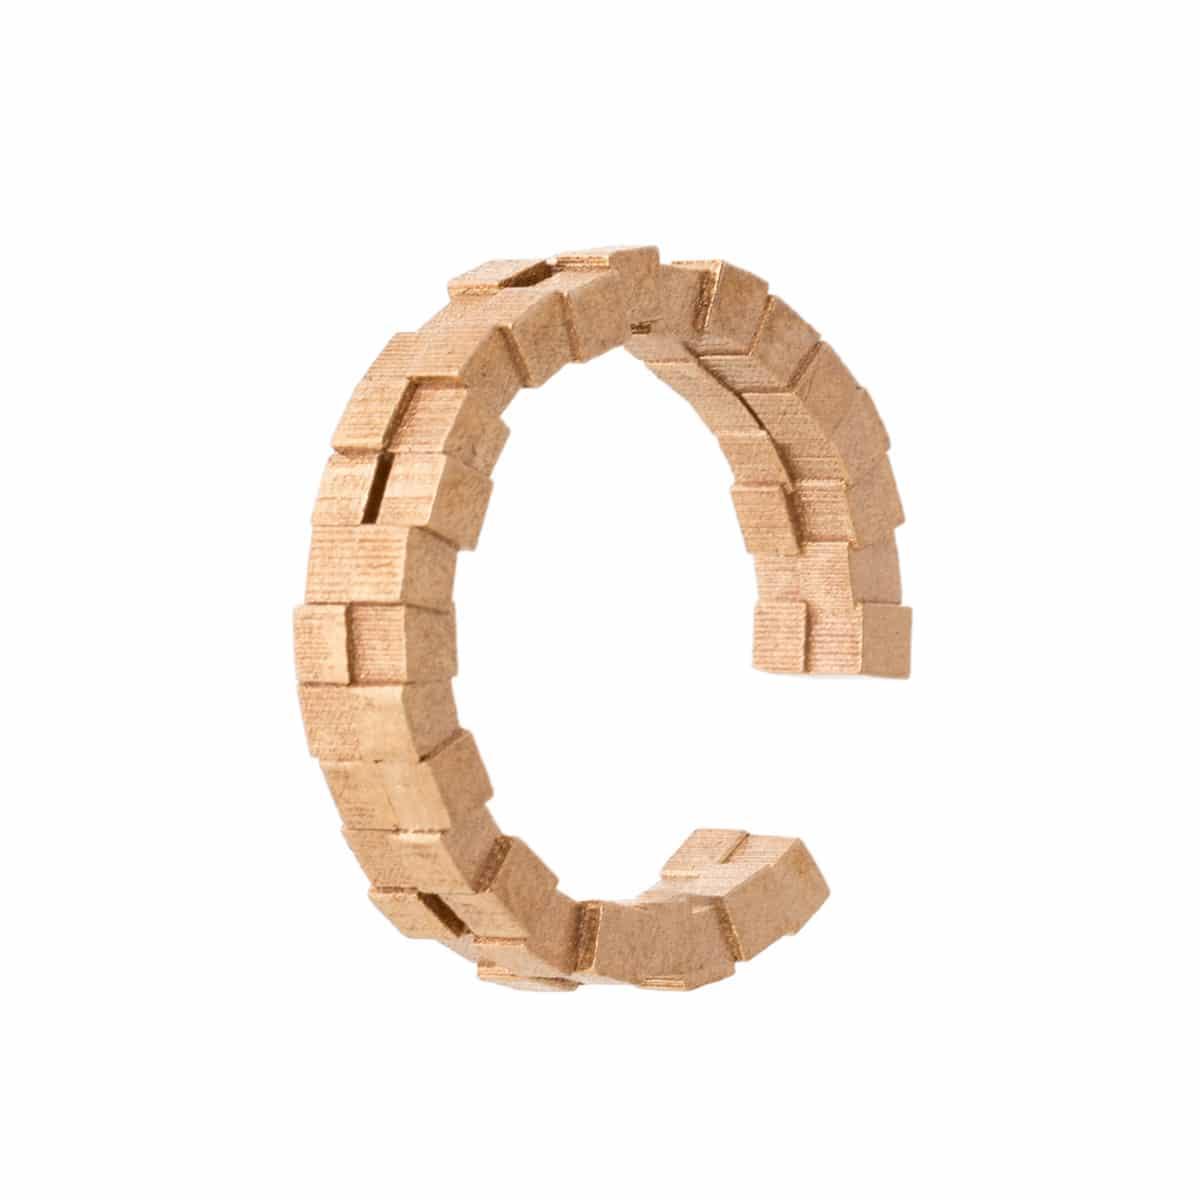 16-Cubii-ring-2.2-mini-raw-bronze-1200px